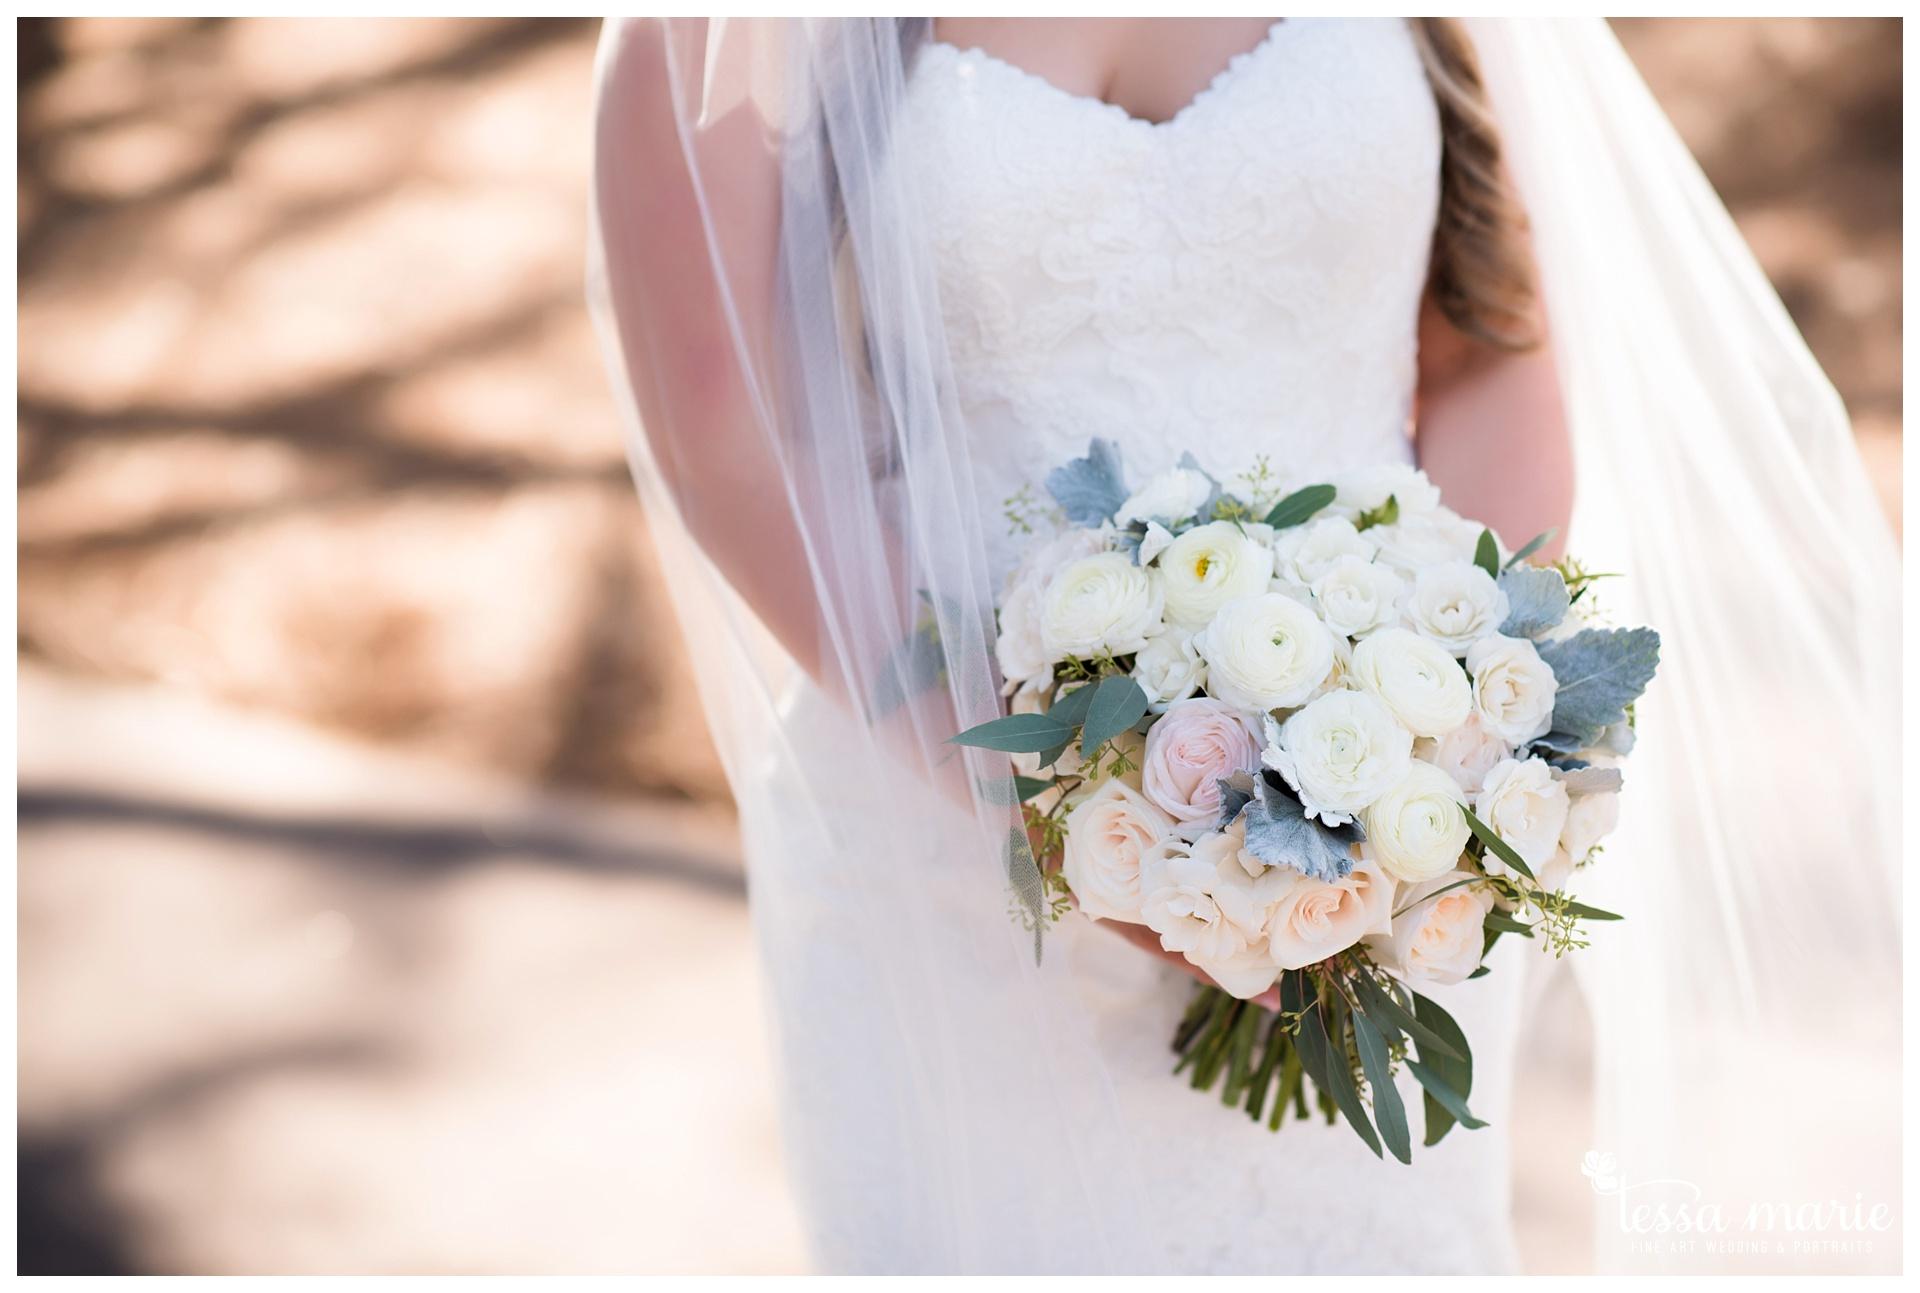 tessa_marie_weddings_legacy_story_focused_wedding_pictures_atlanta_wedding_photographer_0079